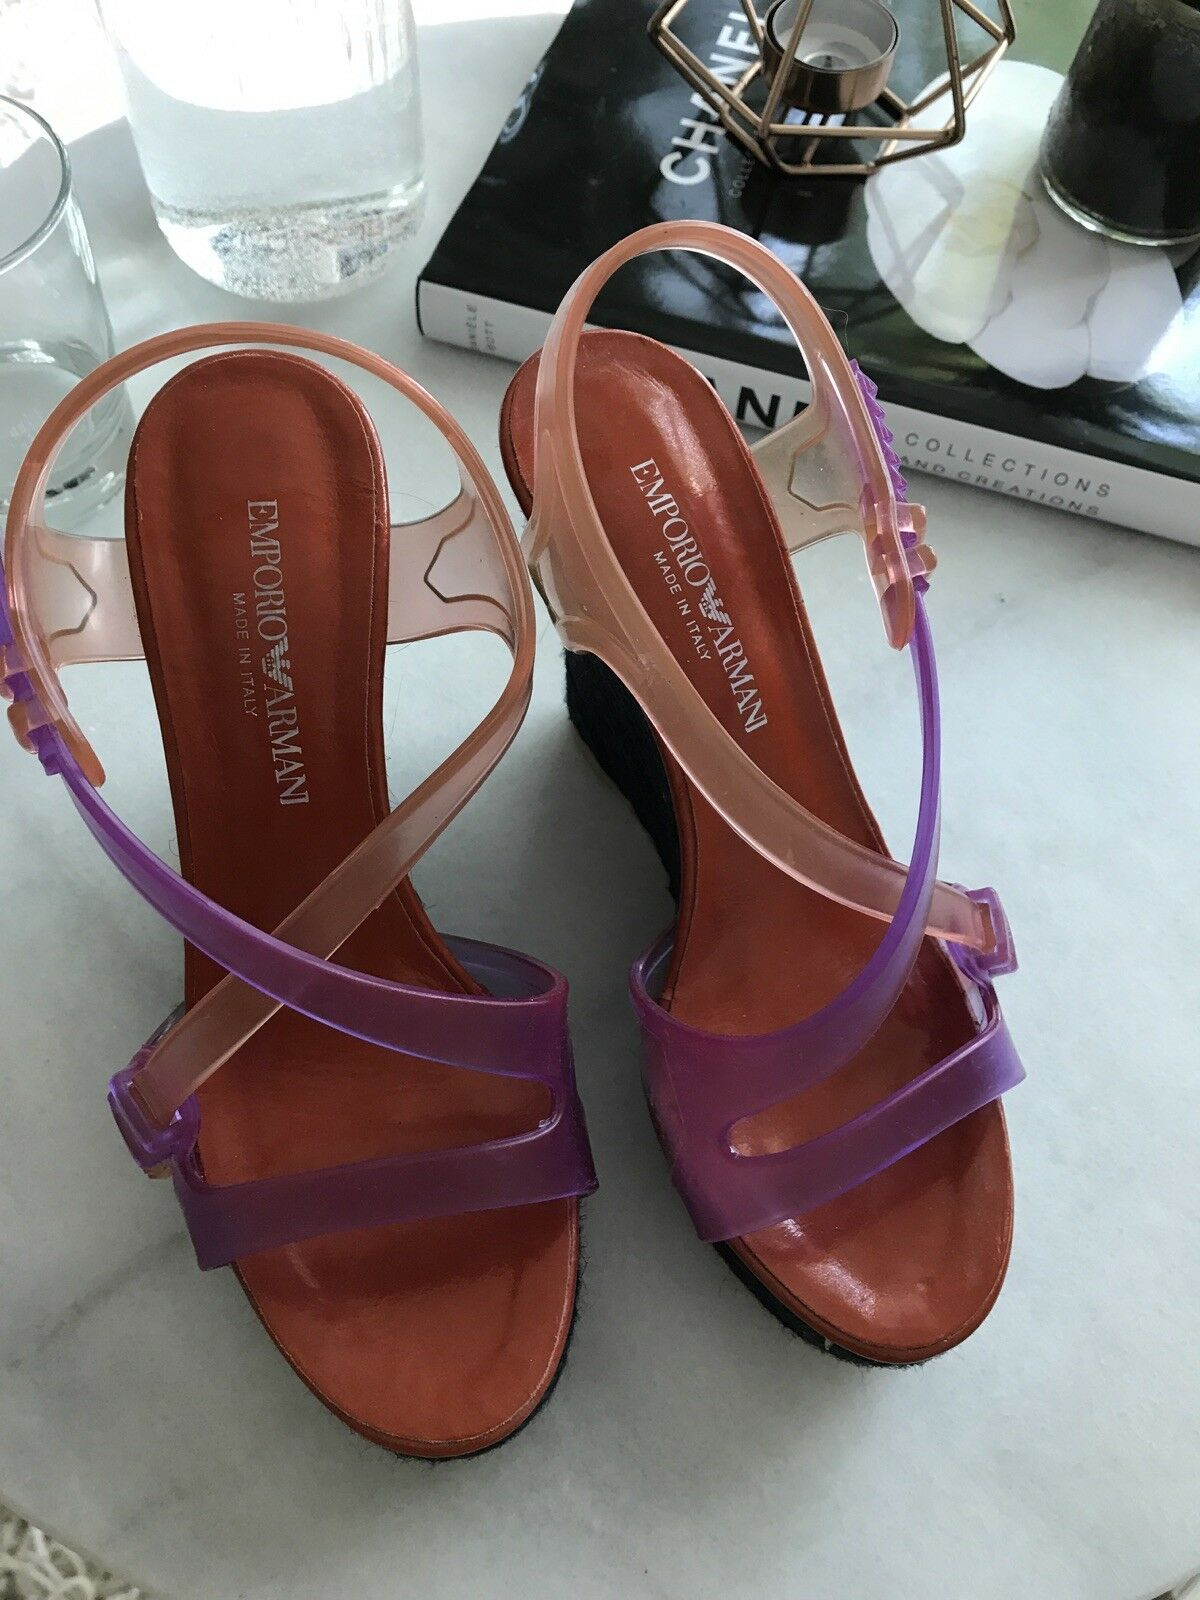 Emporio Armani Schuhe Sandale Wedges